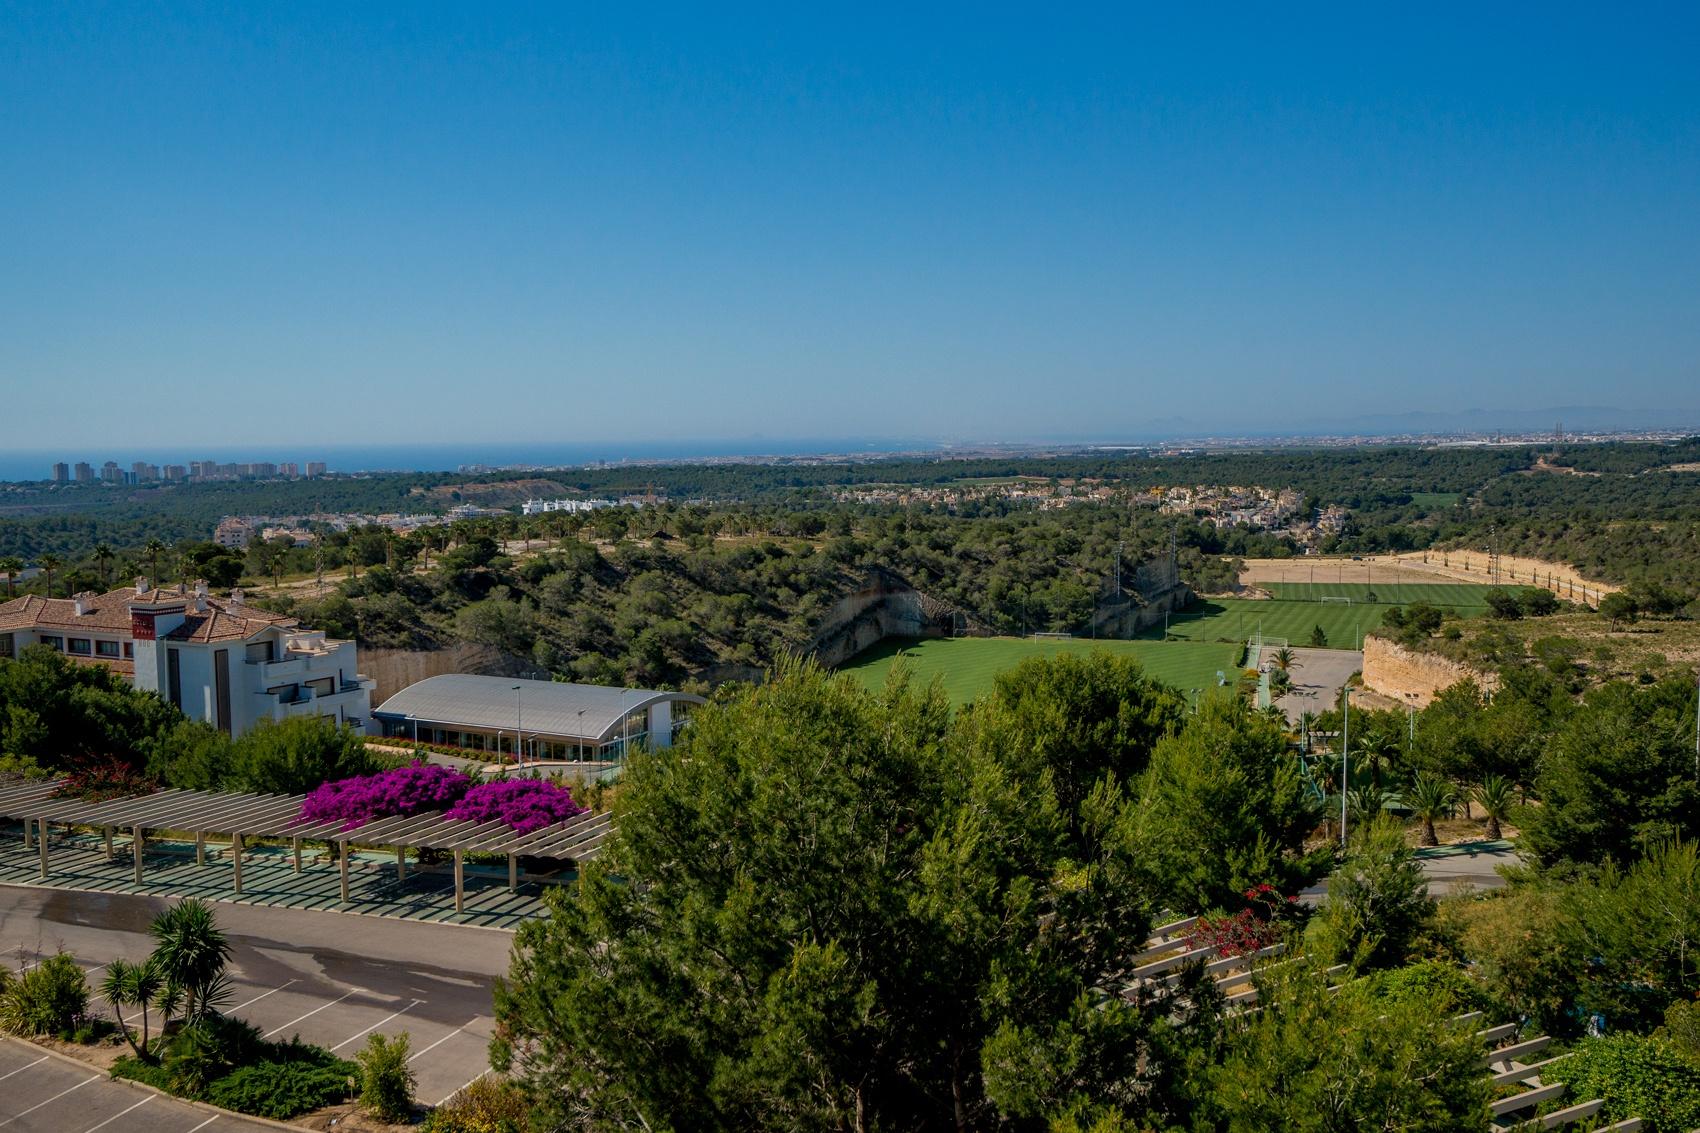 Sport Centre view